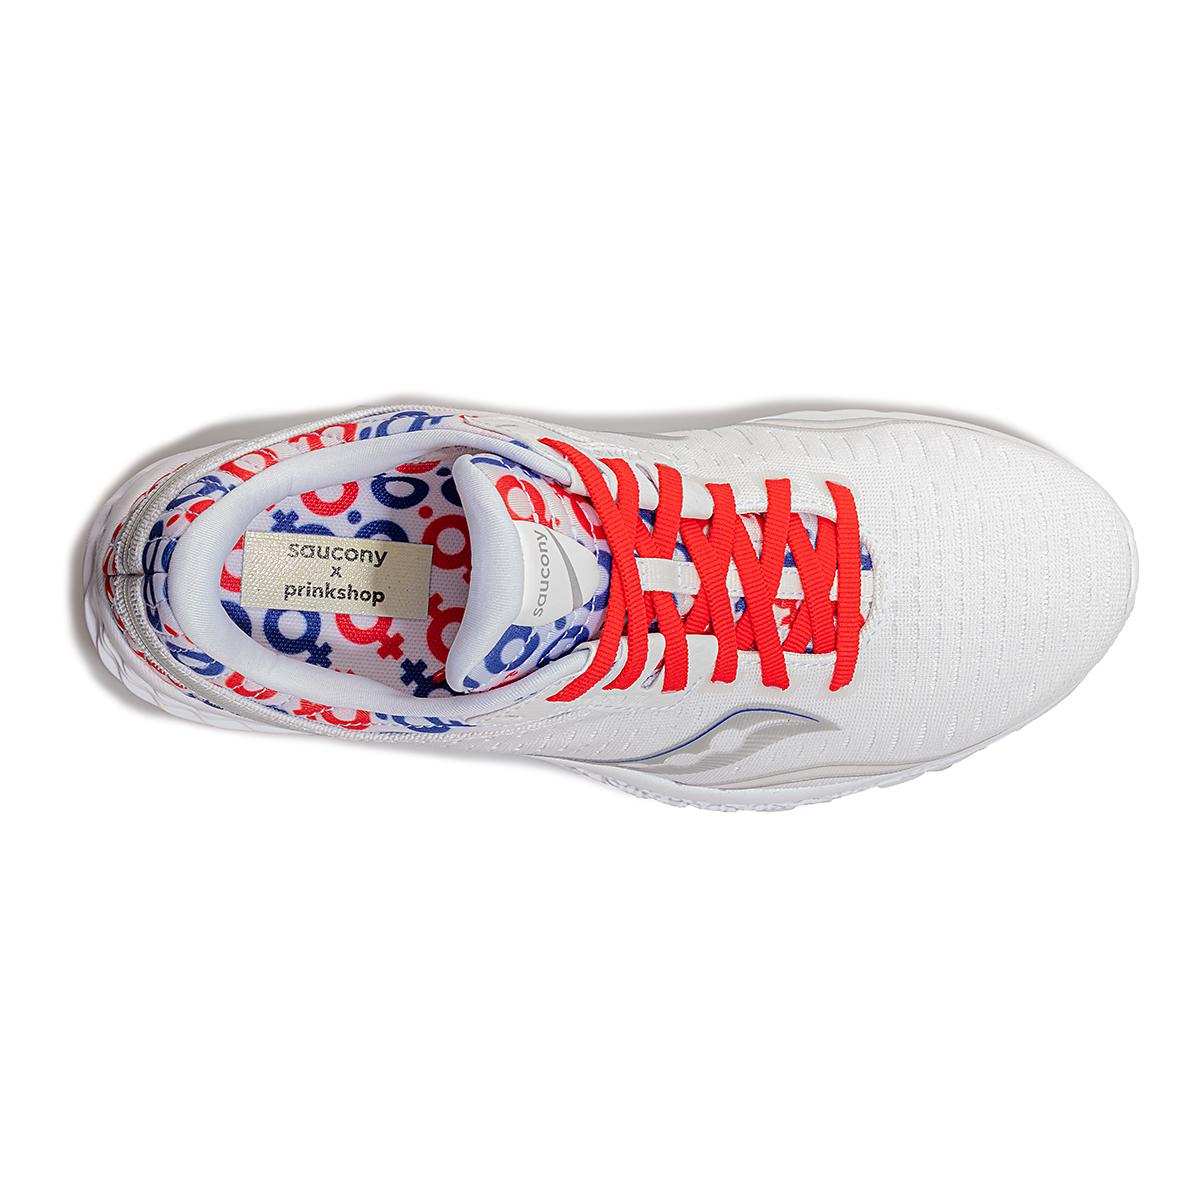 Men's Saucony x Prinkshop Hero Kinvara 11 Running Shoe - Color: Red/White/Blue - Size: 7 - Width: Regular, Red/White/Blue, large, image 3